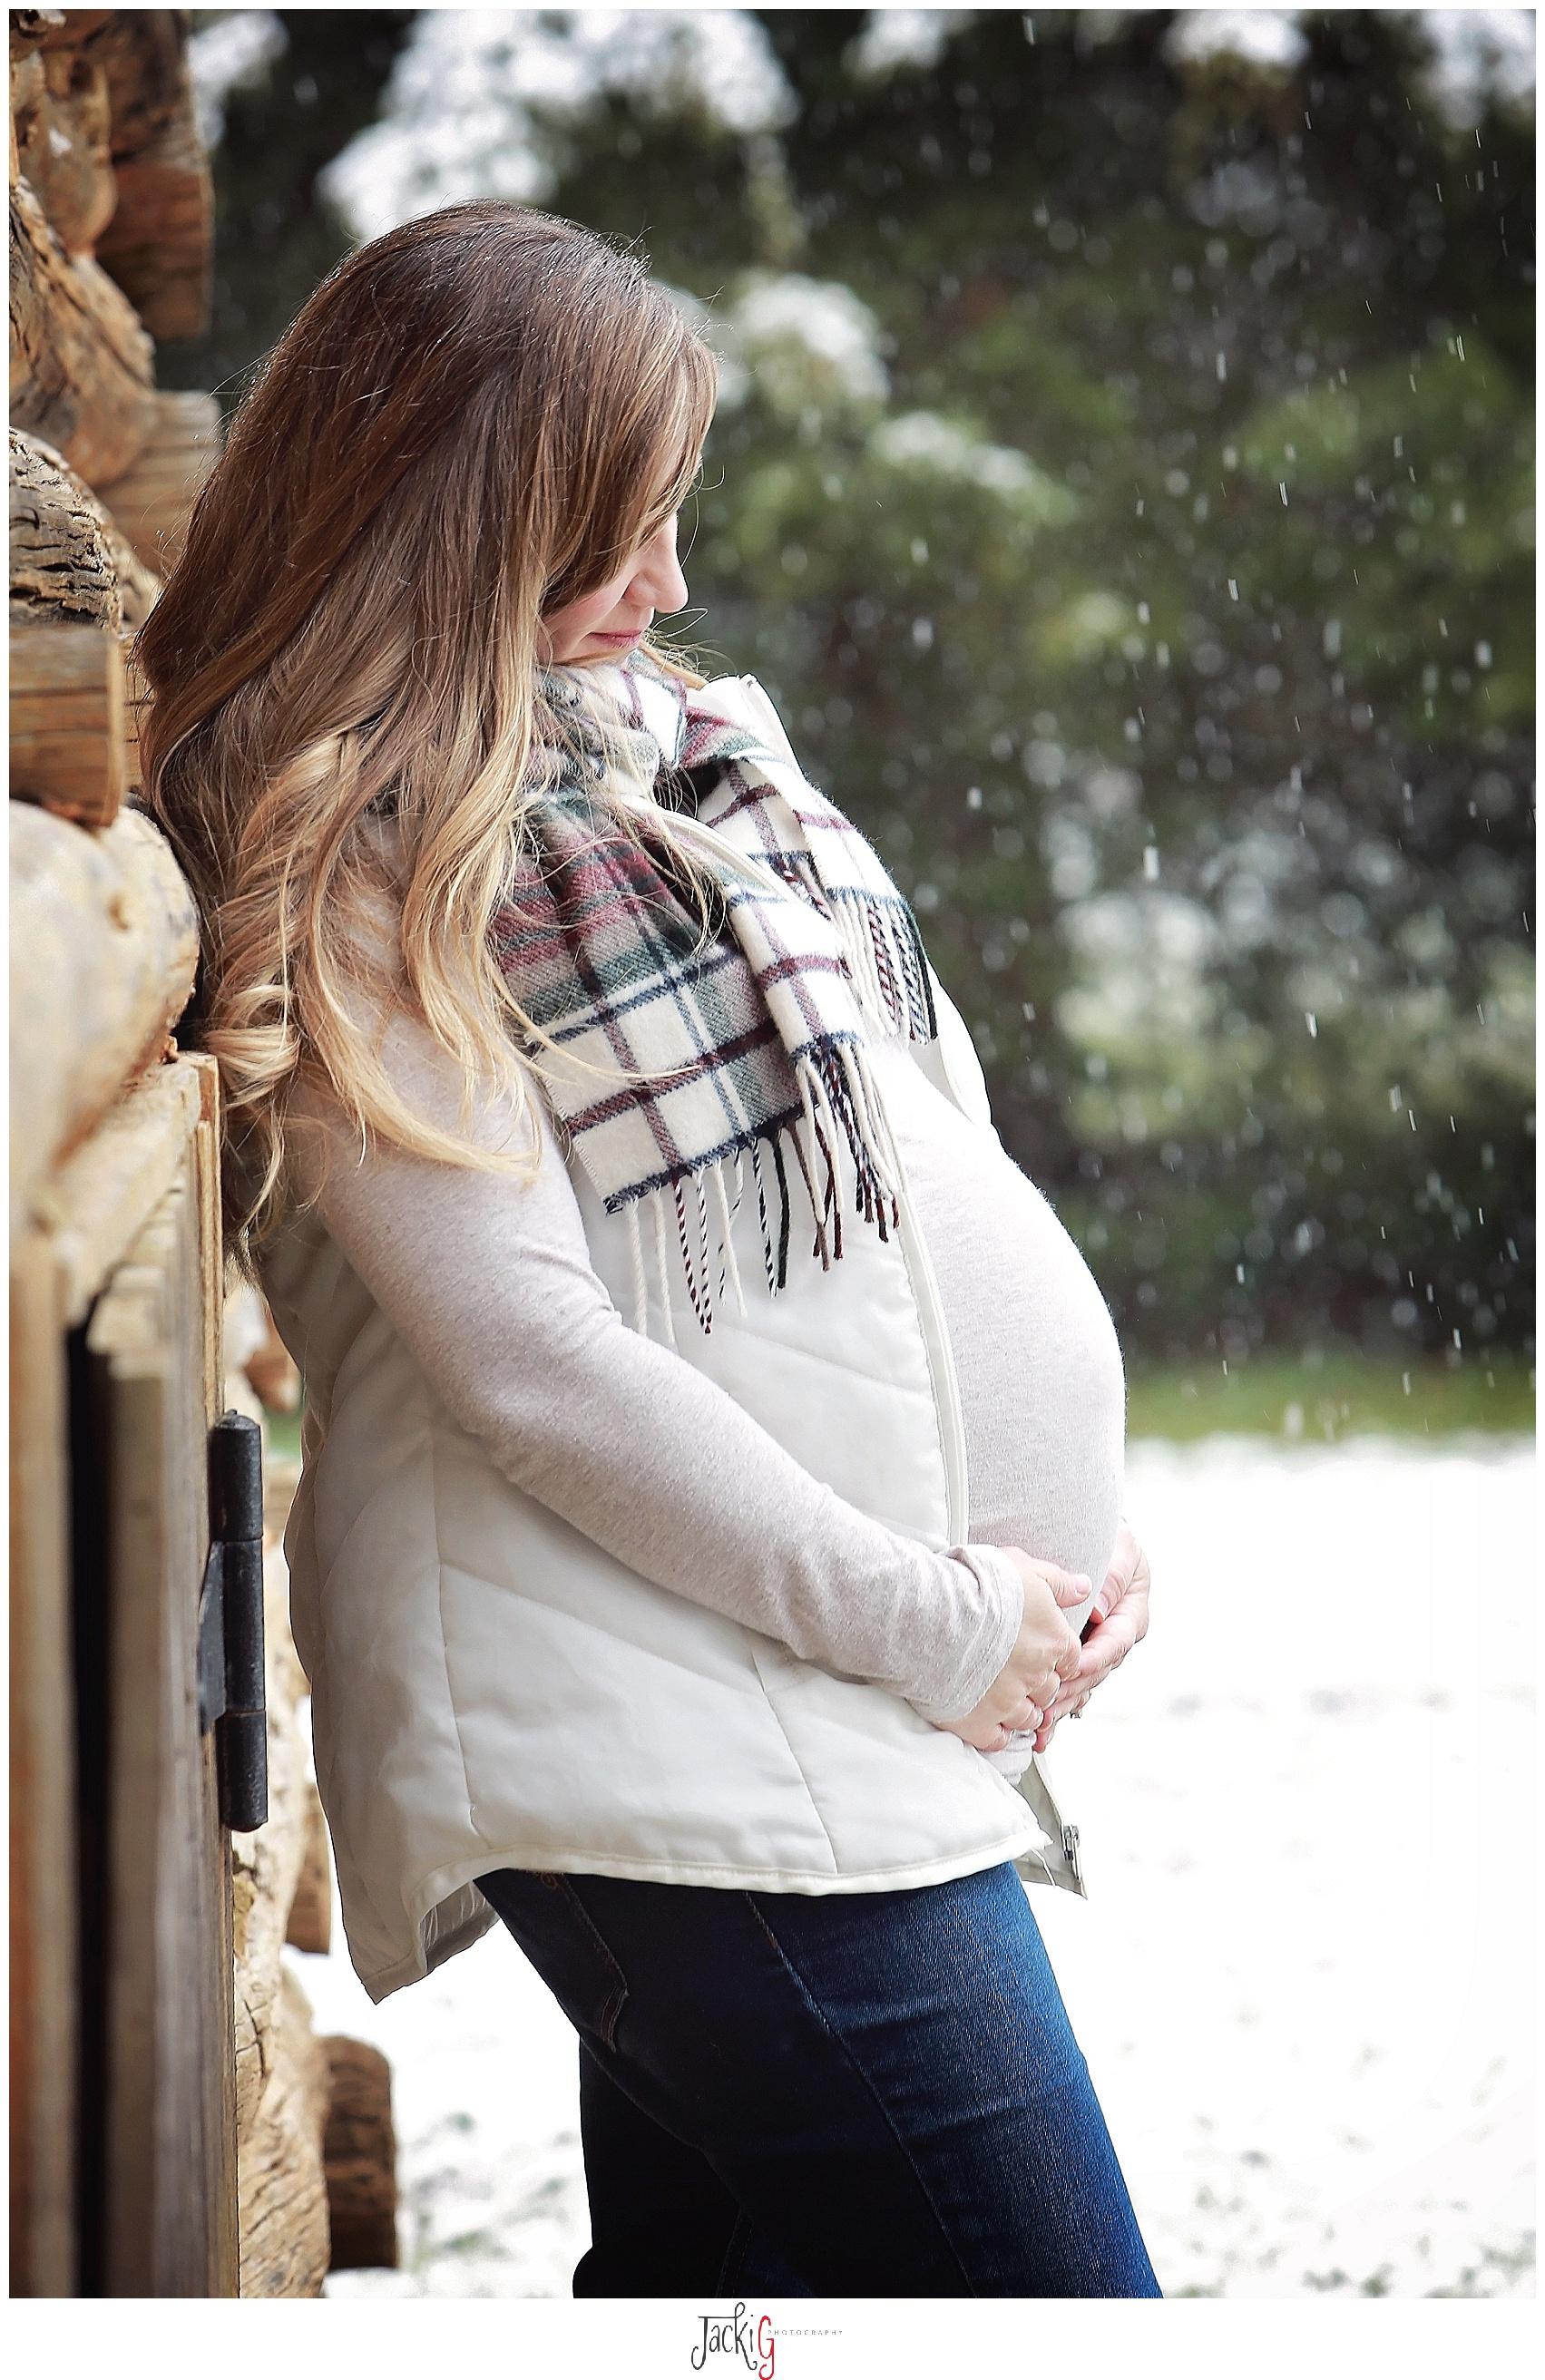 #maternityphotography